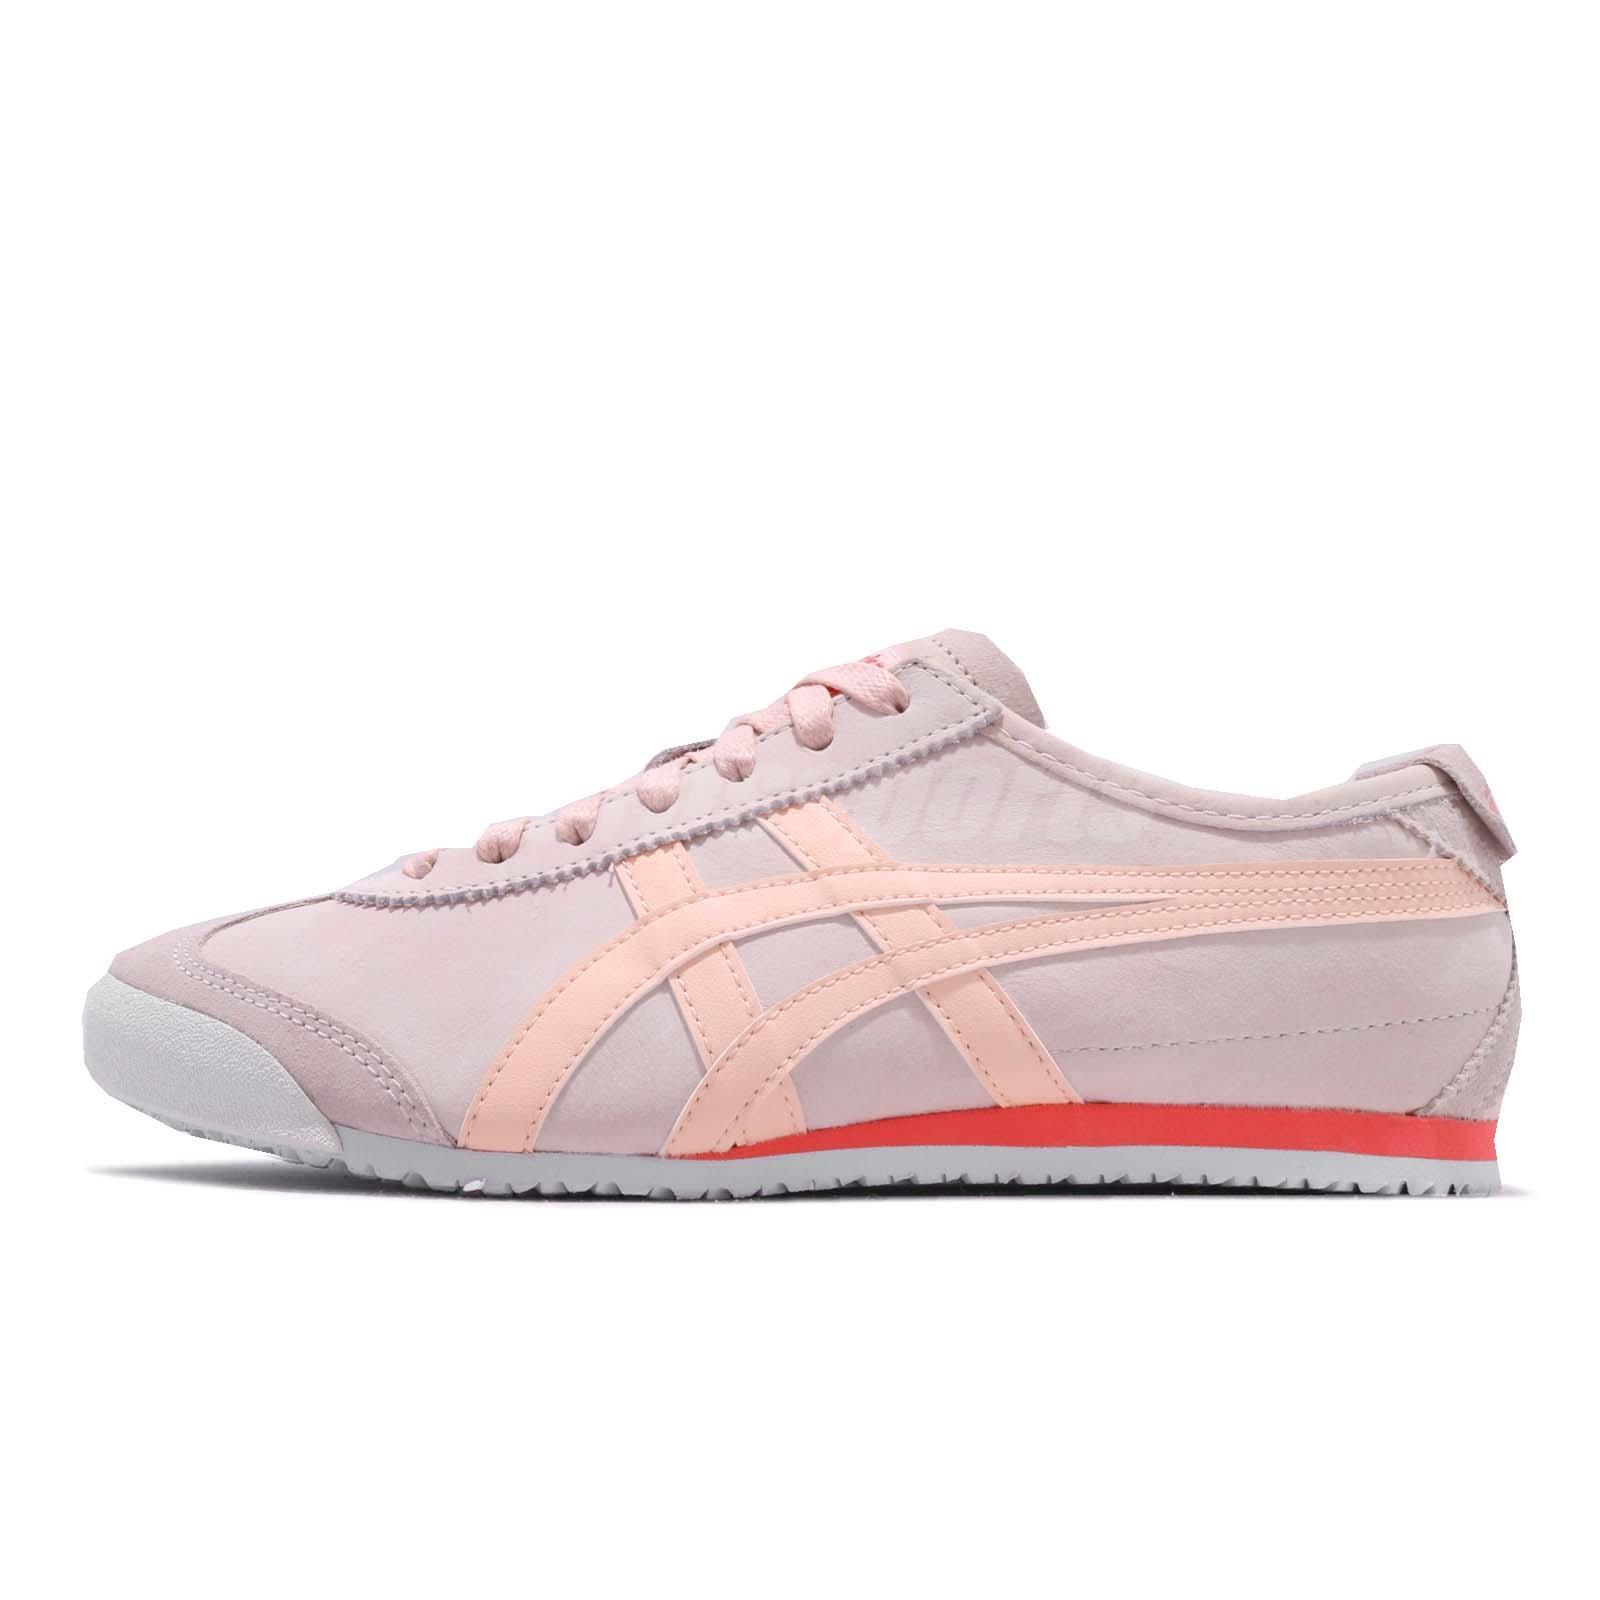 e9e72553c88 Asics Onitsuka Tiger Mexico 66 Blush Breeze Pink Men Women Shoes 1183A359- 701